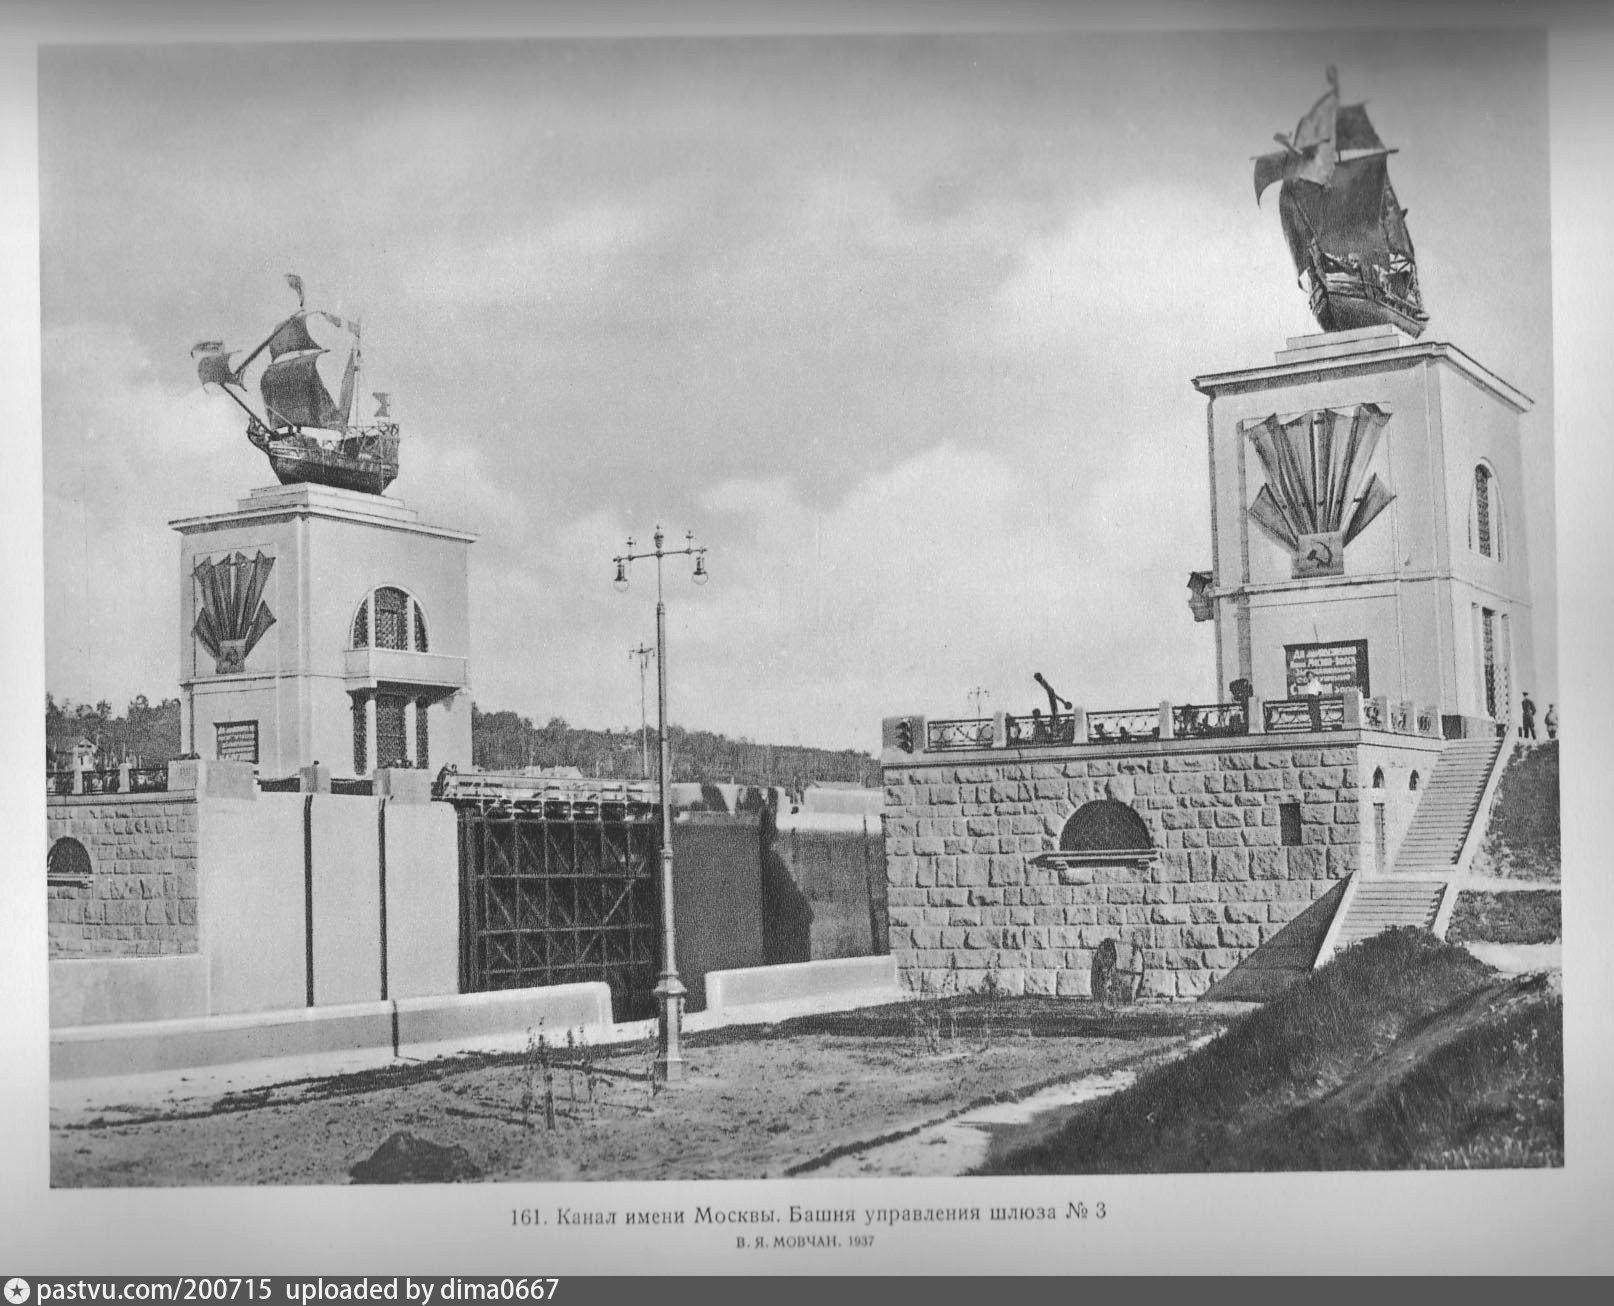 Башня управления шлюза № 3. Архитектор В.Я.Мовчан 1947  –  1949